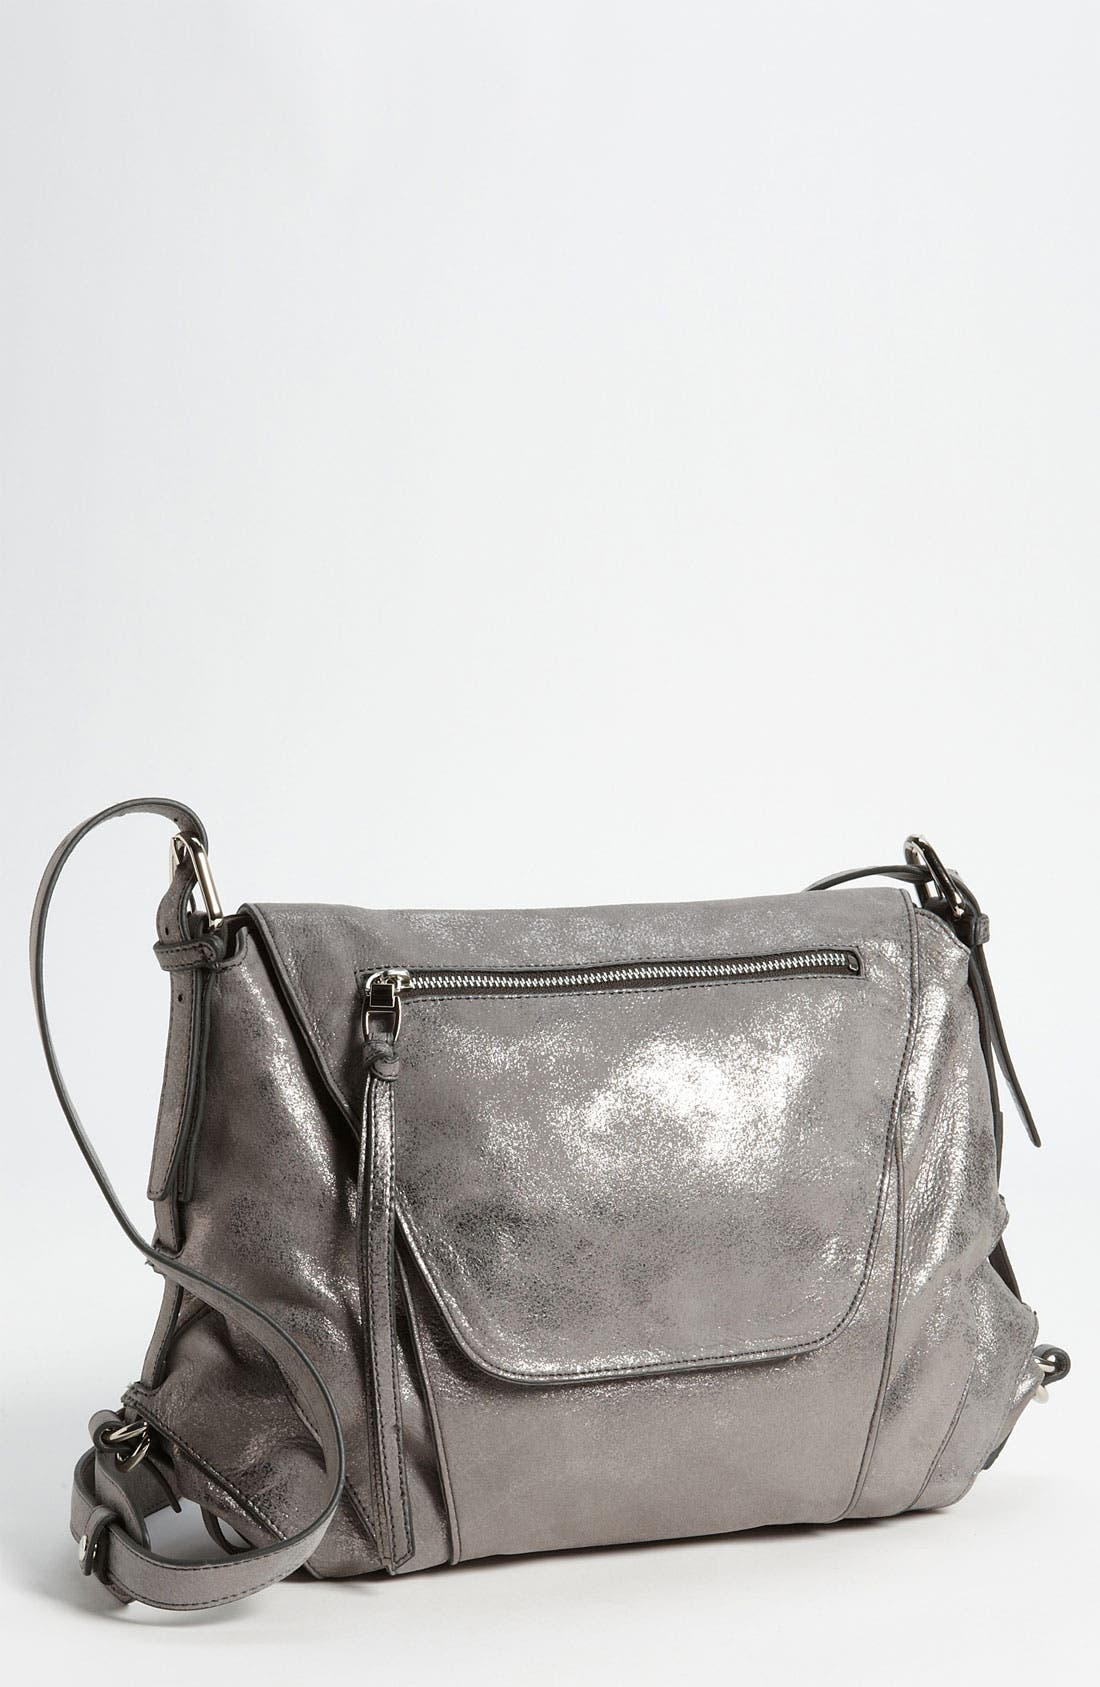 Alternate Image 1 Selected - Kooba 'Brielle' Glitter Leather Crossbody Bag